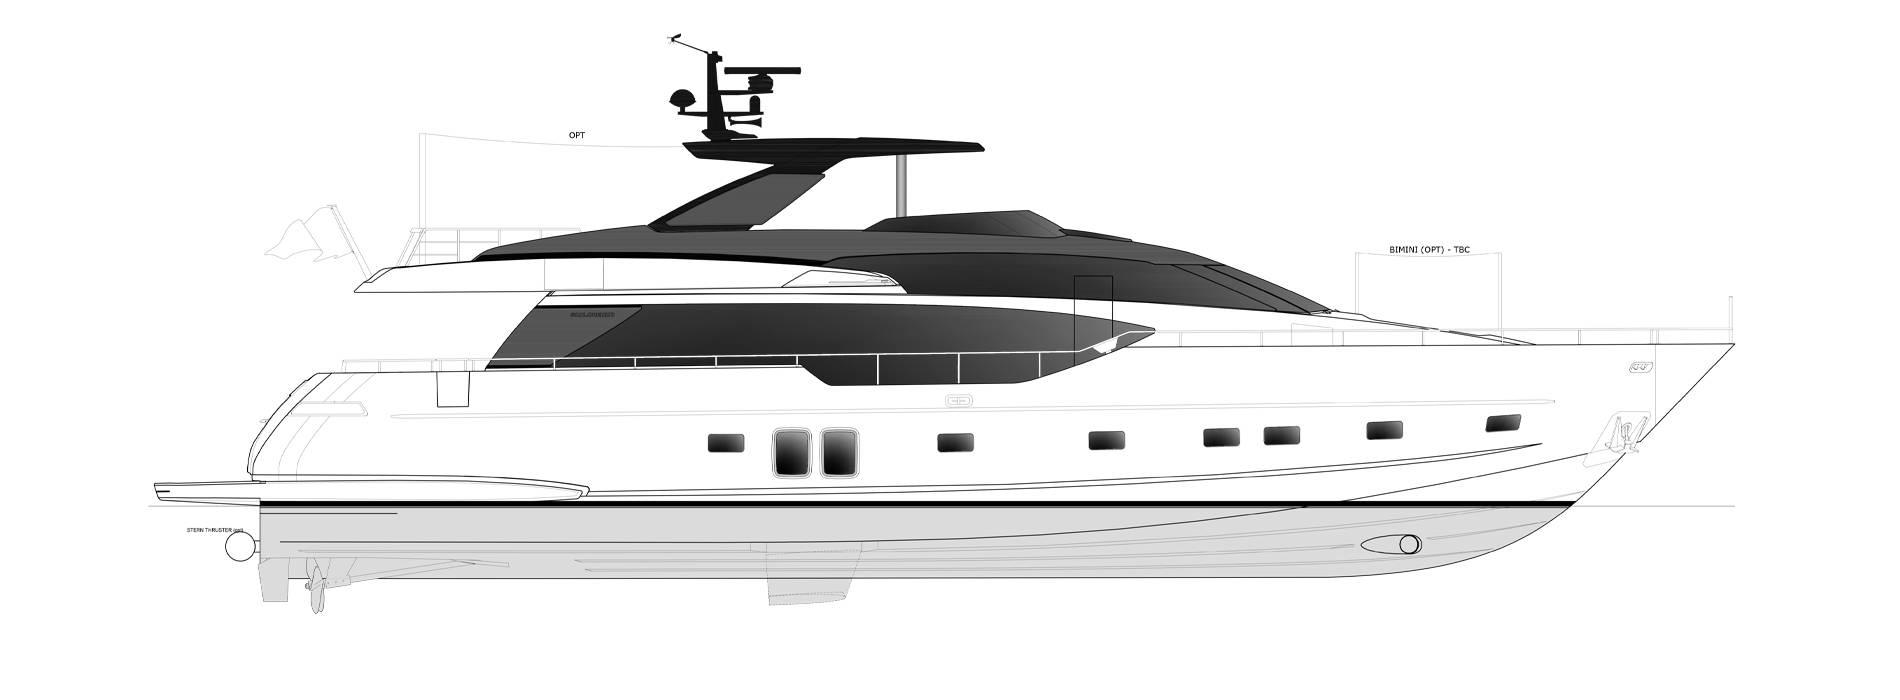 Sanlorenzo Yachts SL86-727 Profilo